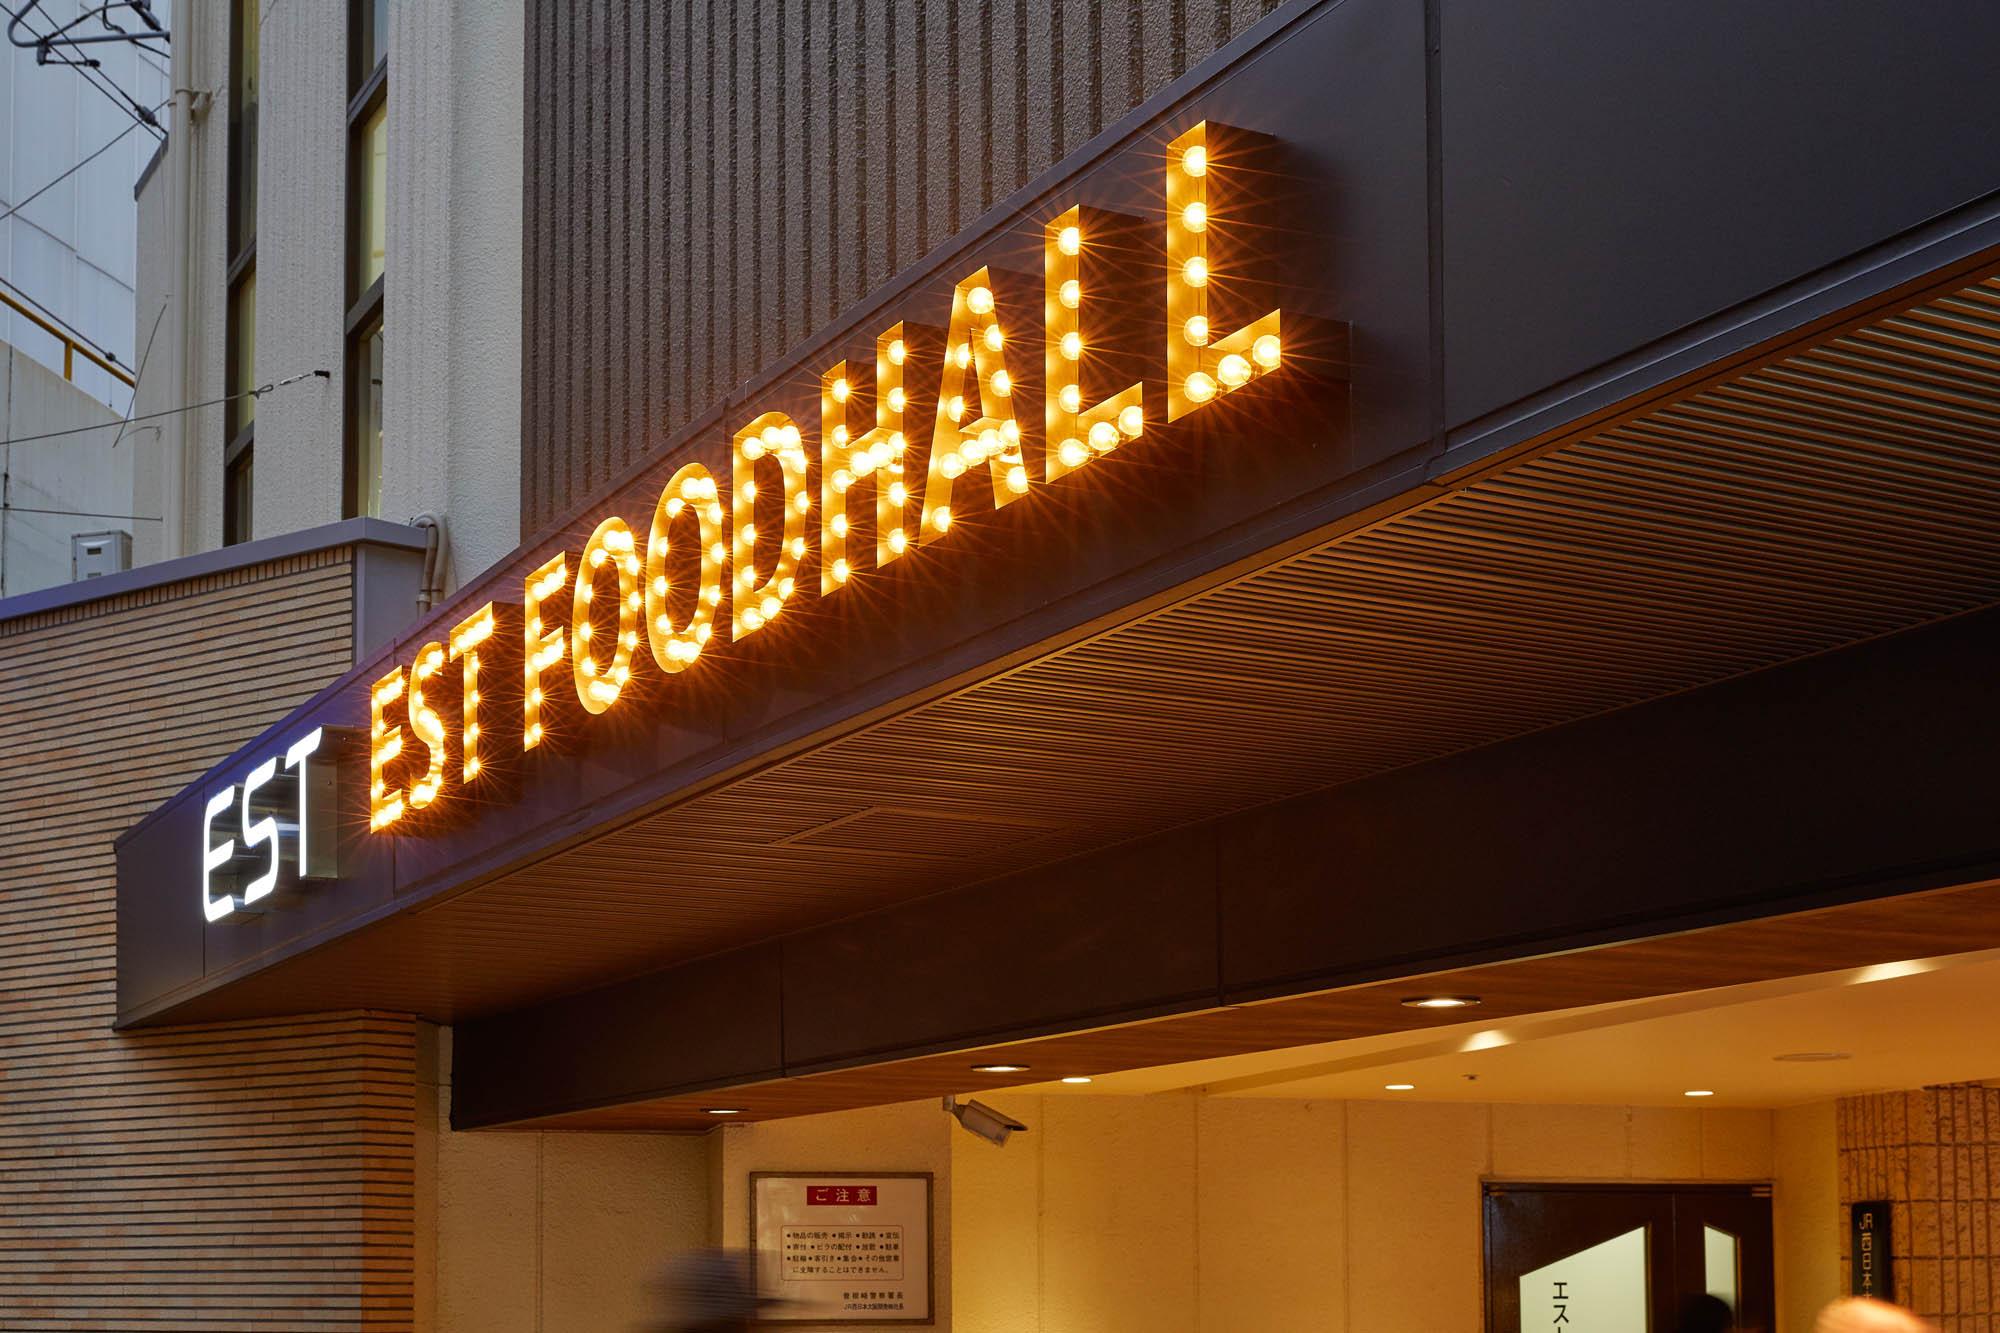 EST FOODHALL 外側入口の実績写真